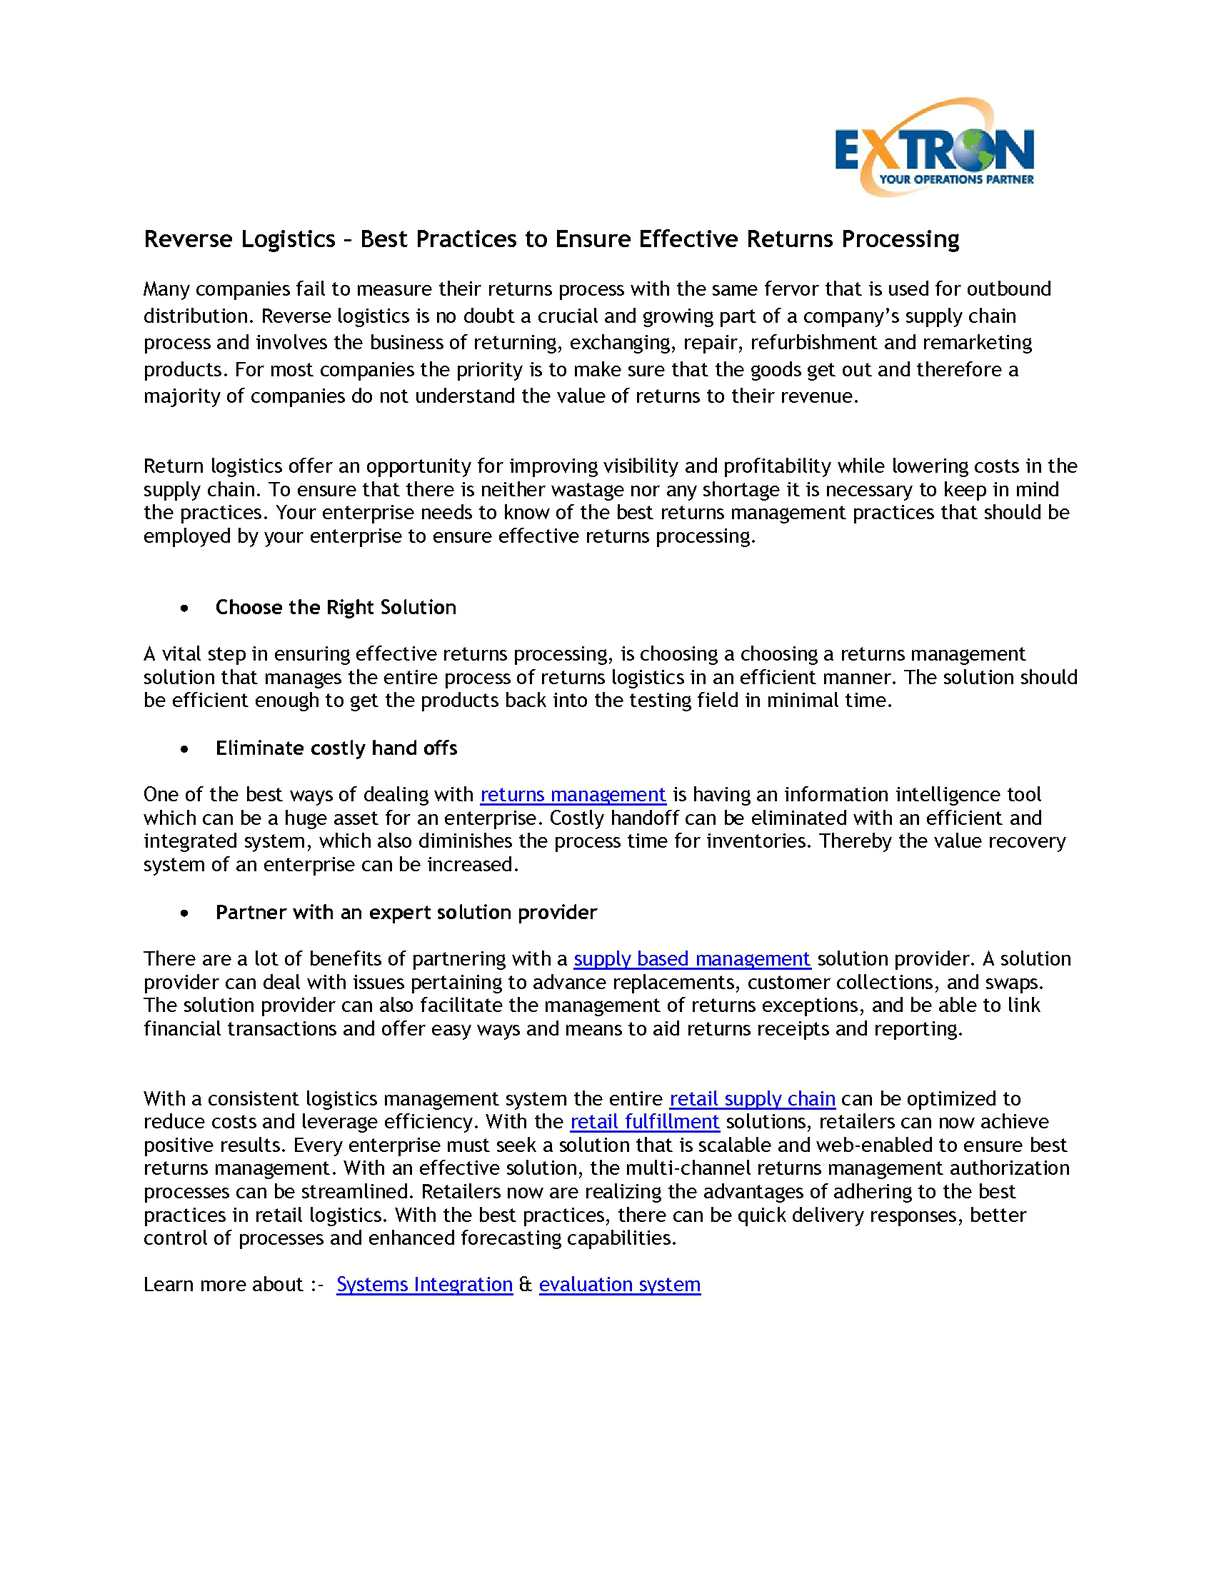 Calaméo - Reverse Logistics – Best Practices to Ensure